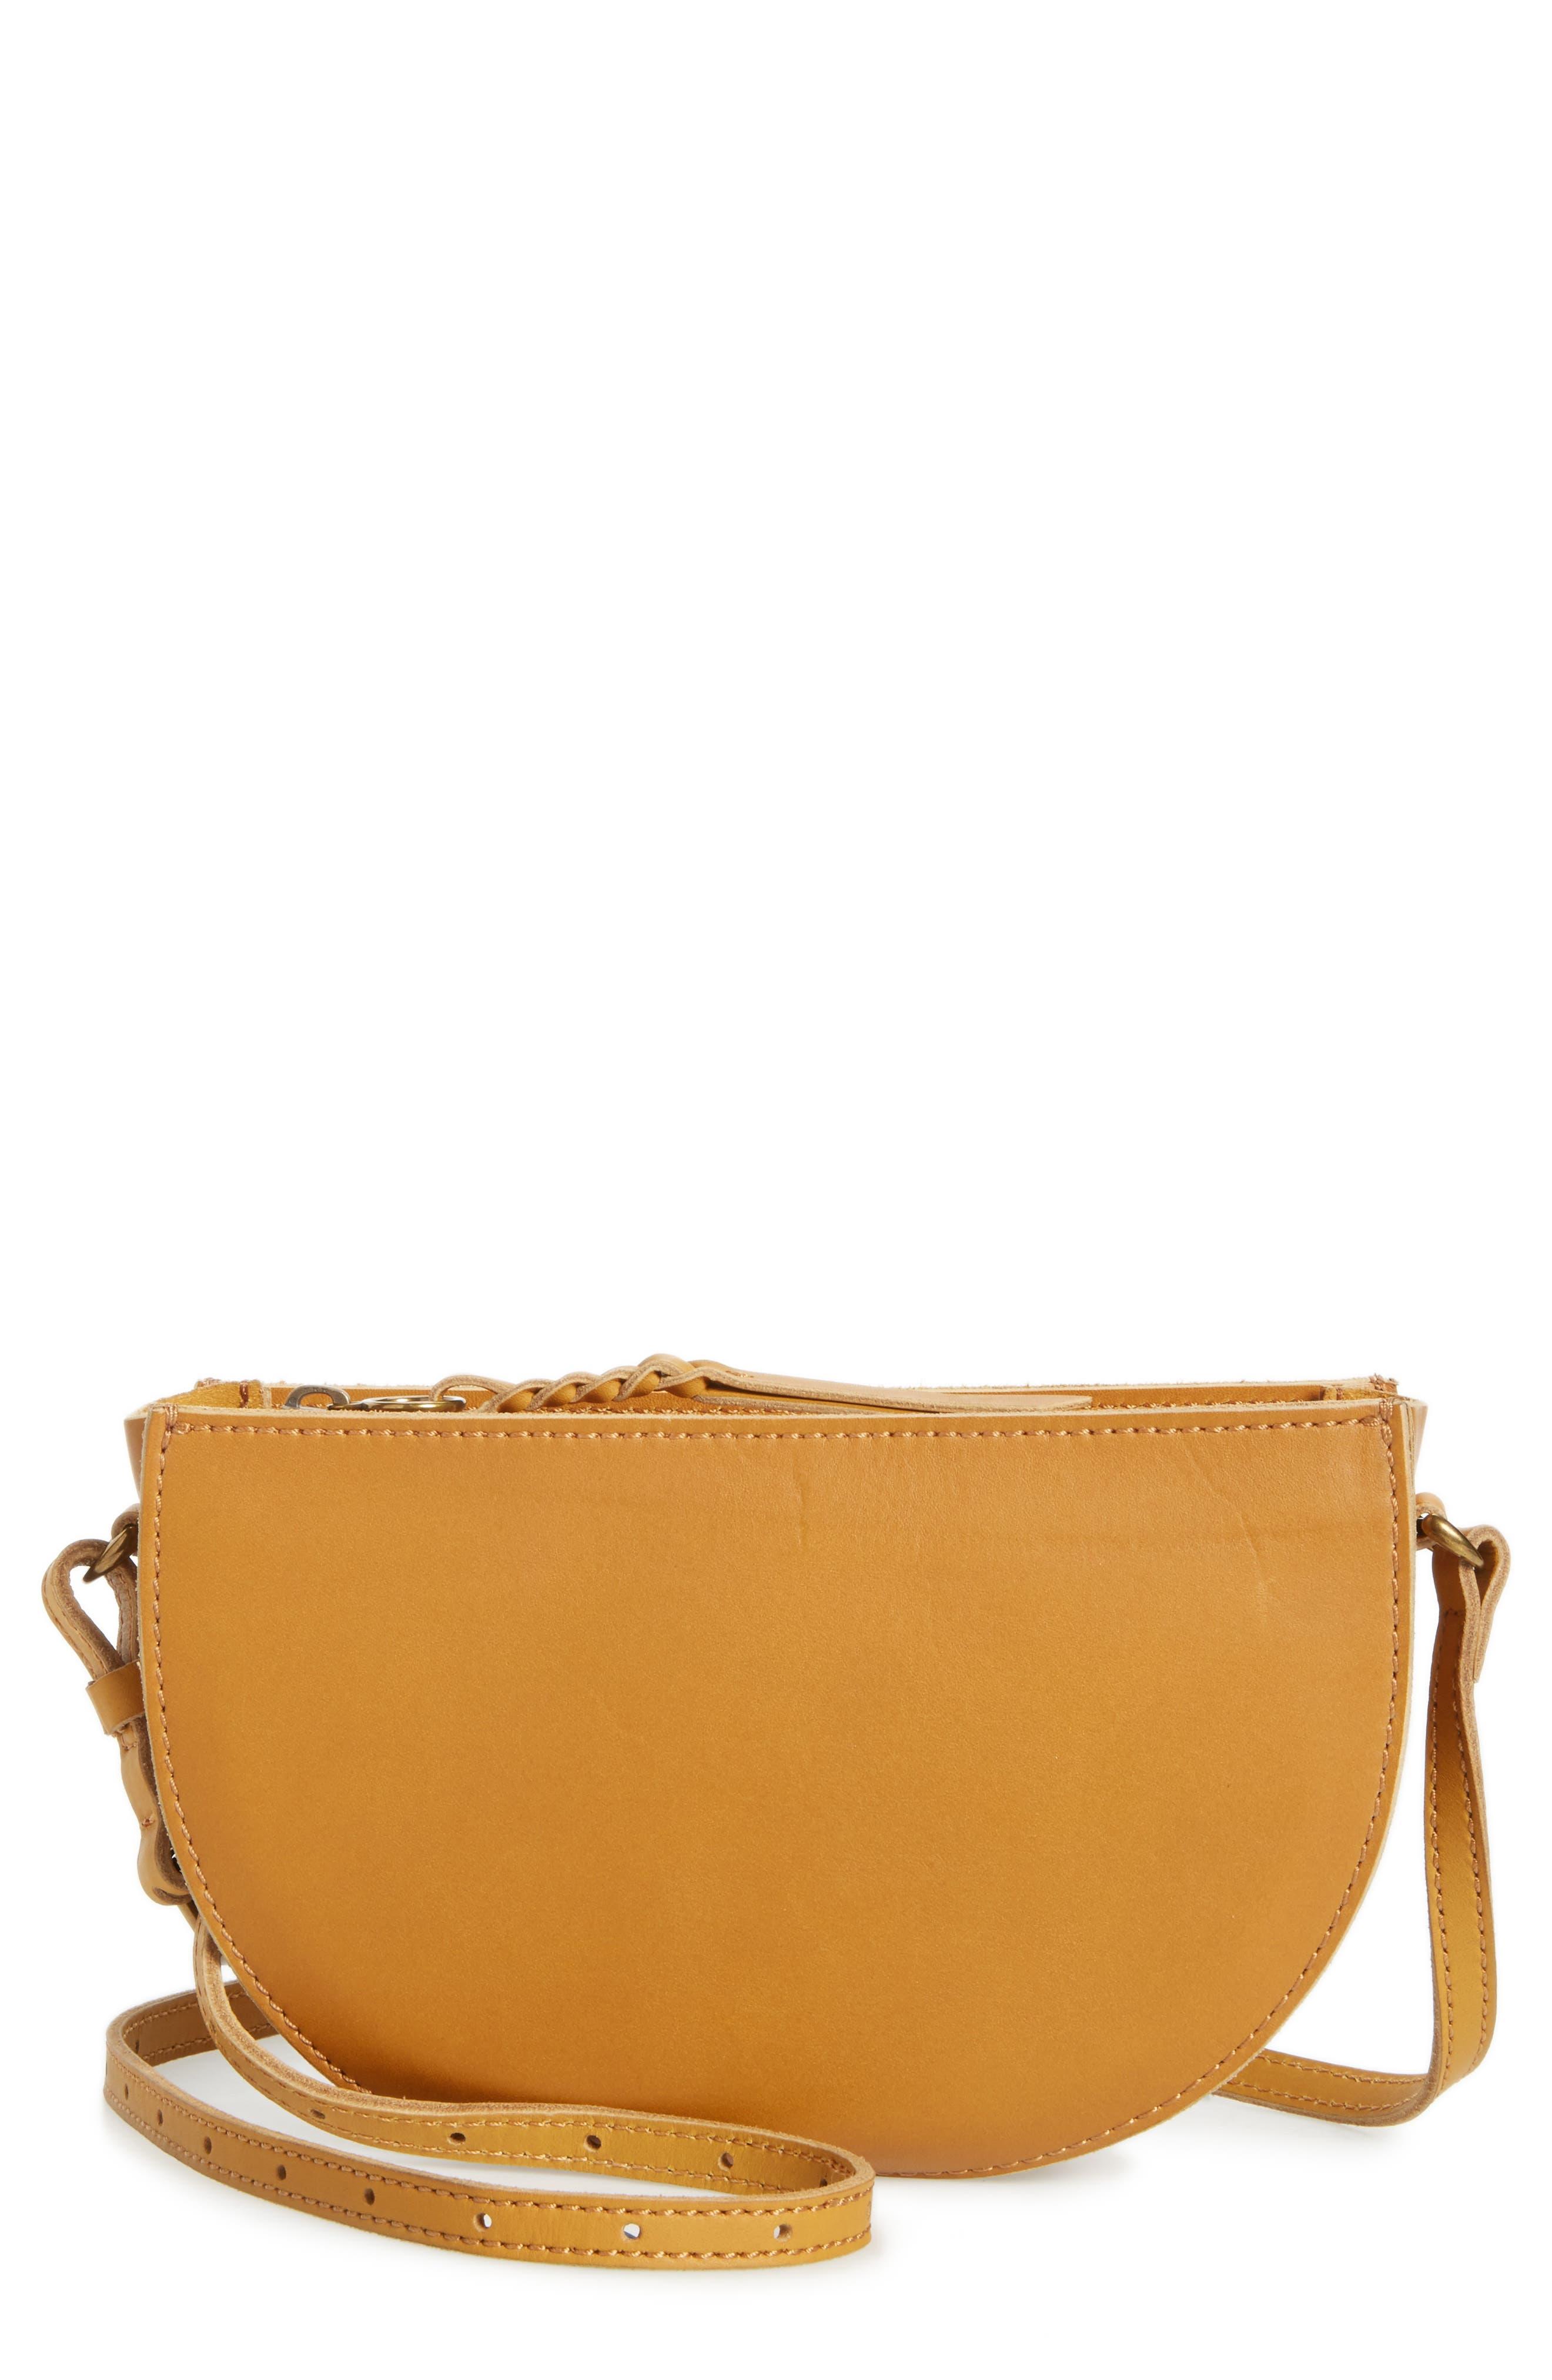 Juniper Vachetta Leather Half Moon Crossbody Bag,                             Main thumbnail 2, color,